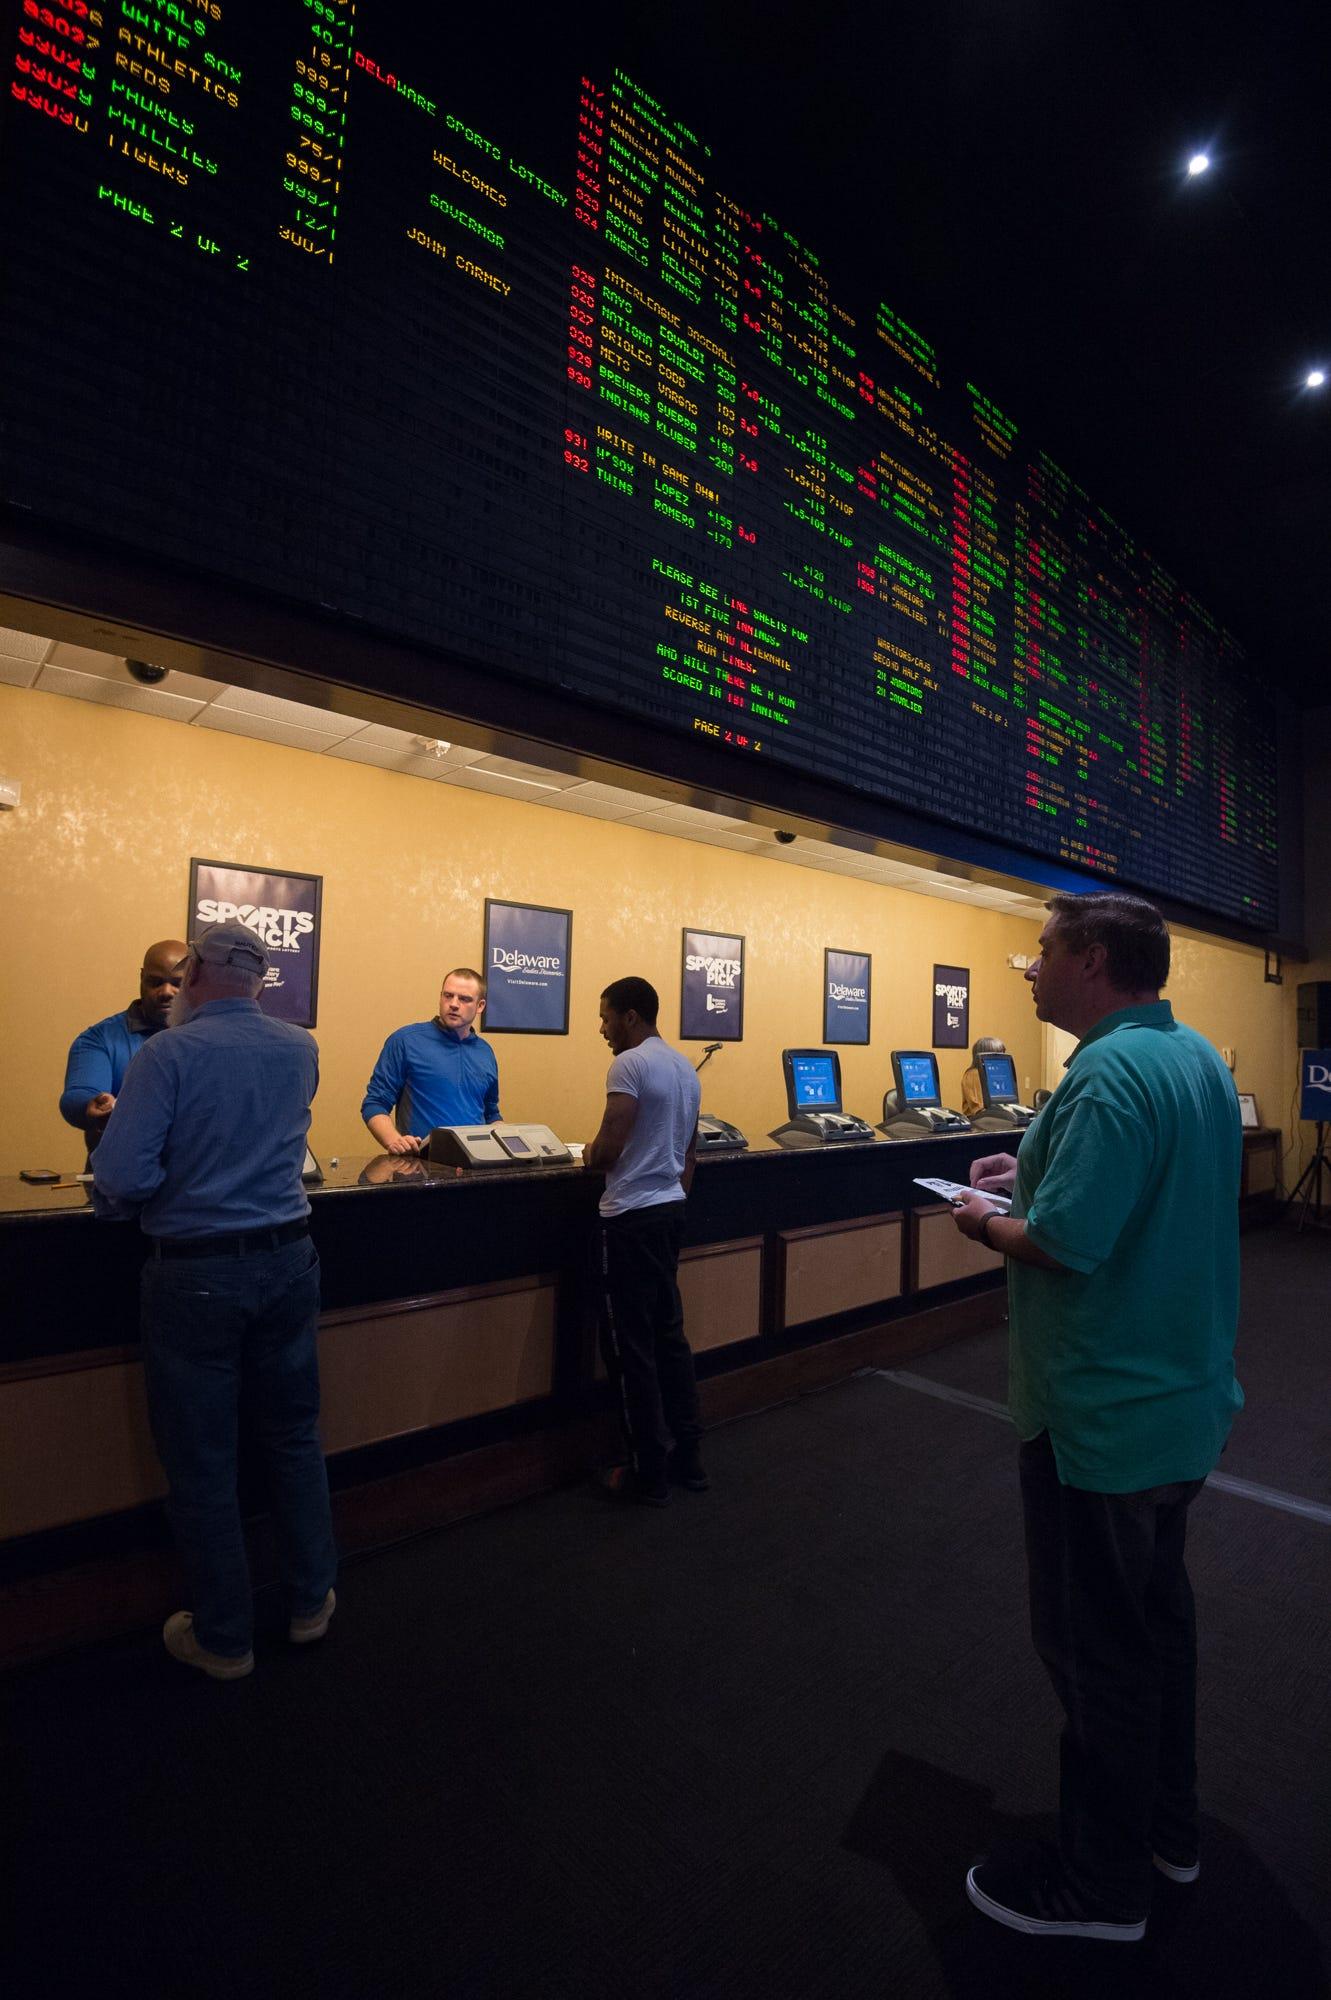 history of gambling in las vegas